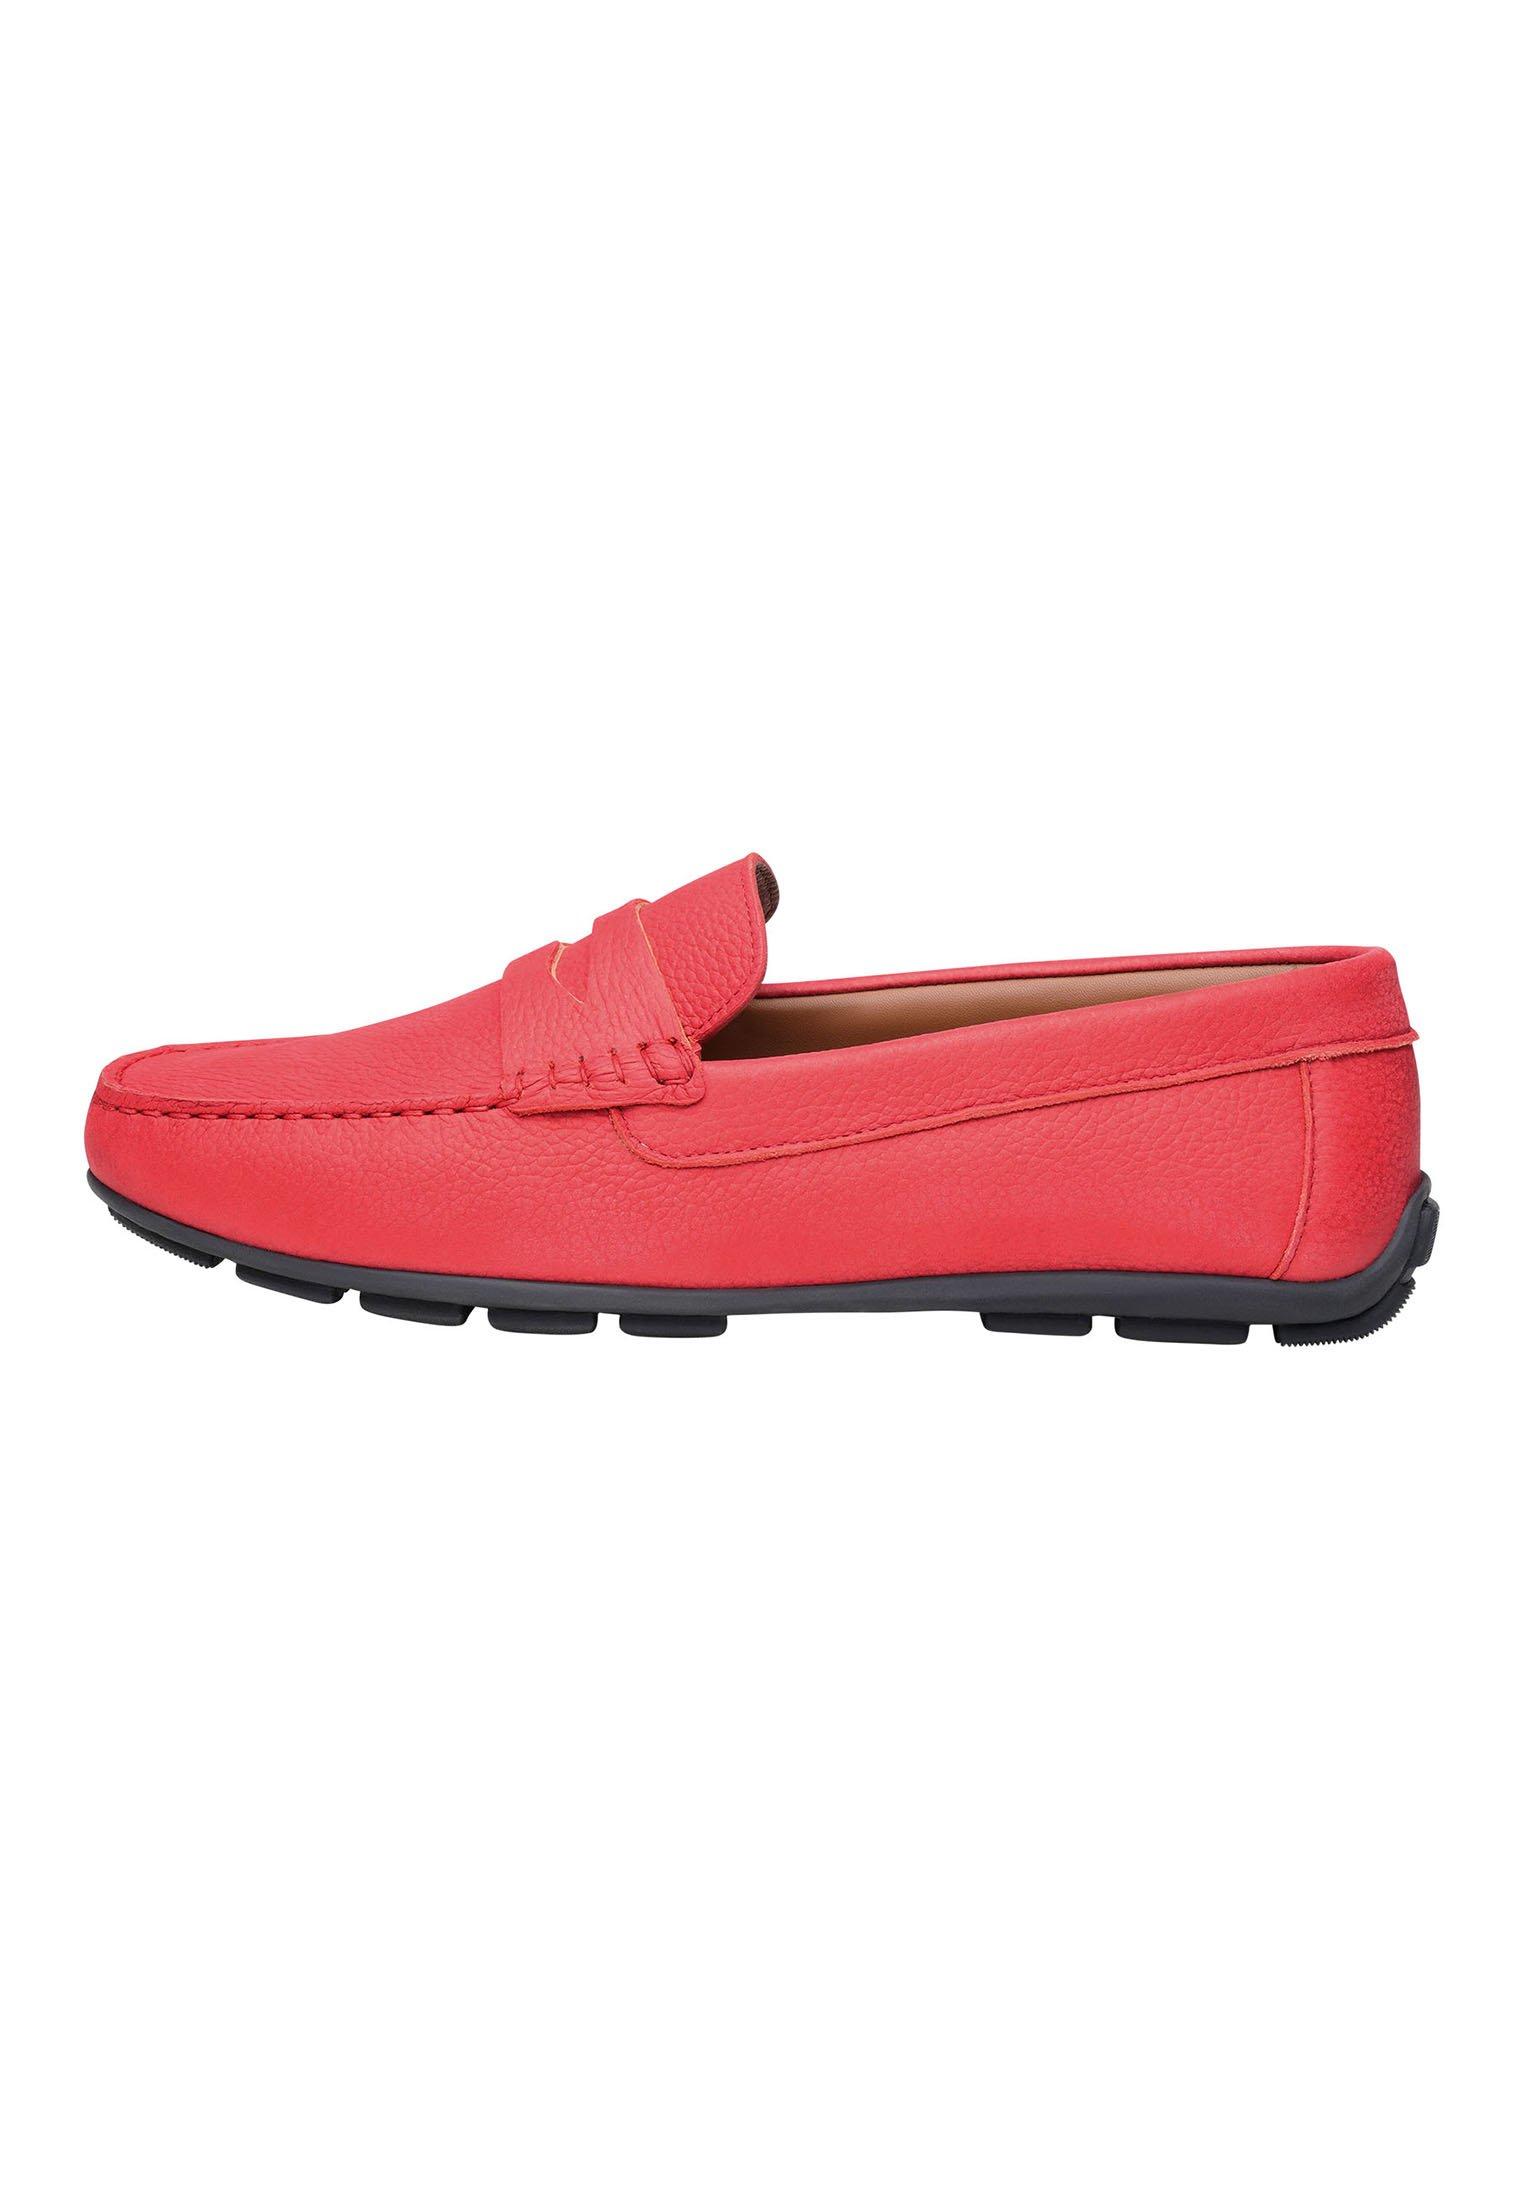 Geringster Preis SHOEPASSION NO. 16 MM - Mokassin - red | Damenbekleidung 2020